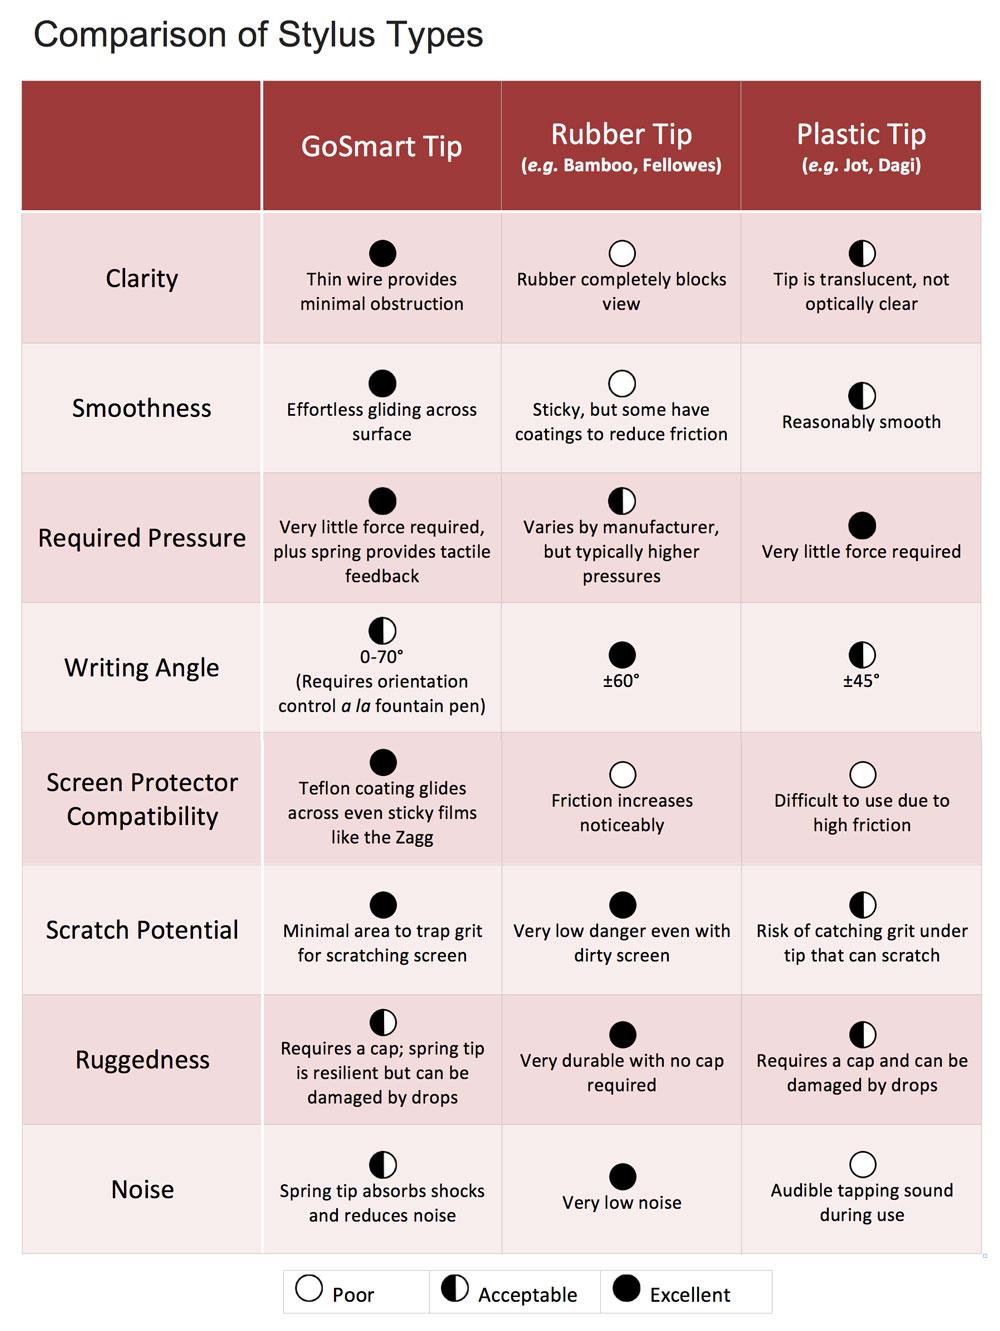 GoSmart-Stylus-Comparison-chart.jpg